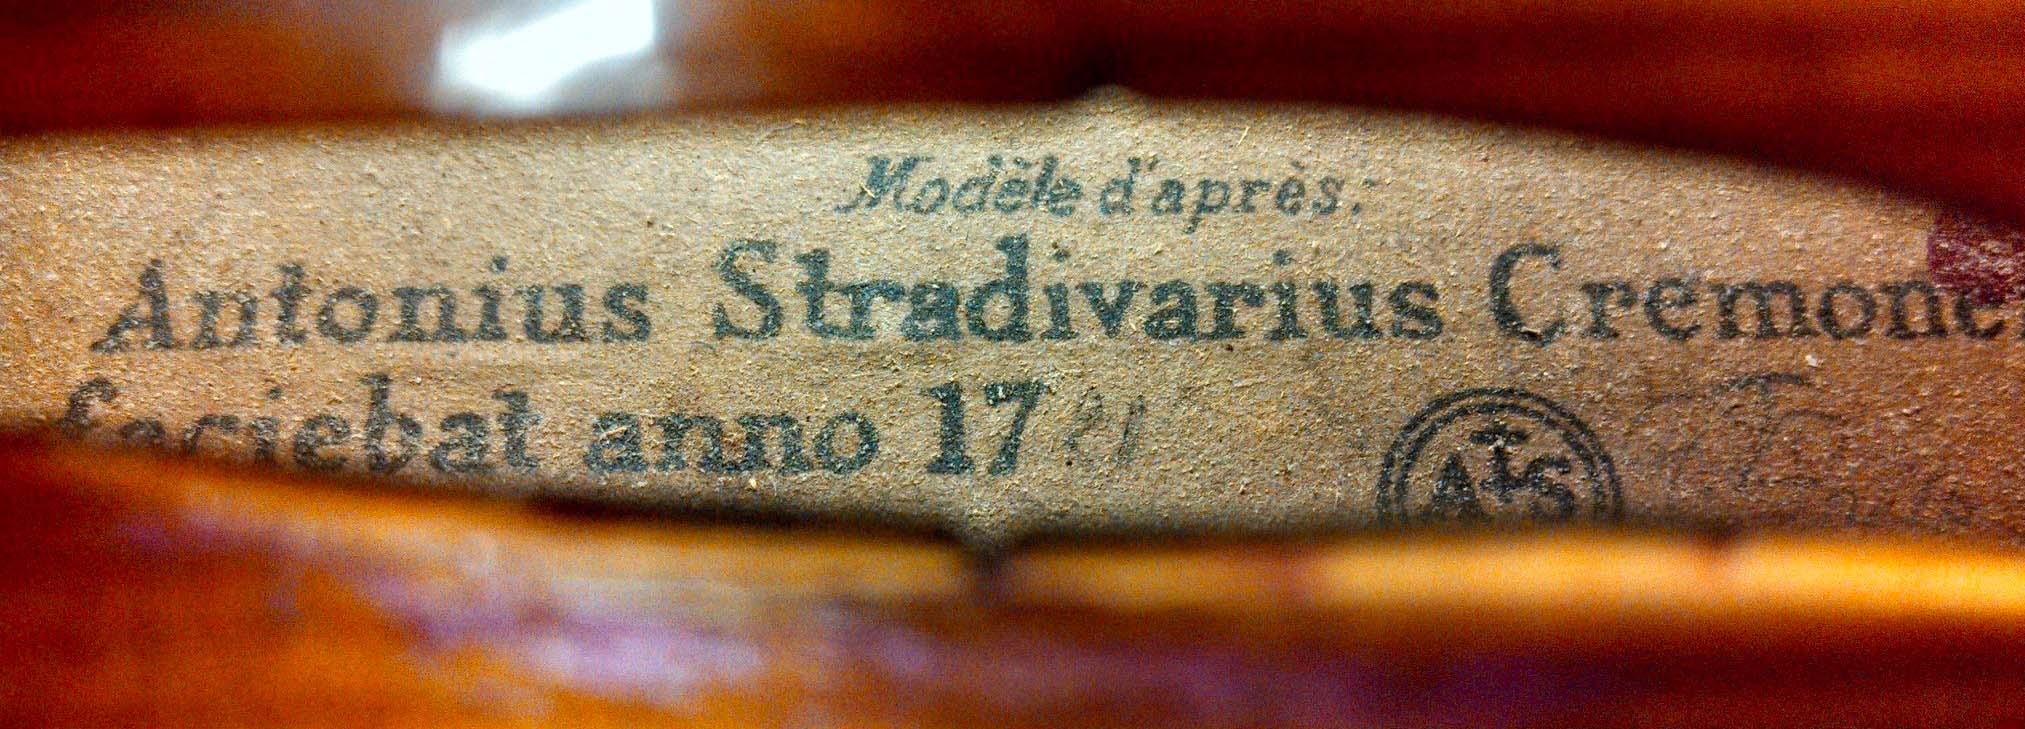 Firma y símbolo original de Antonio Stradivari